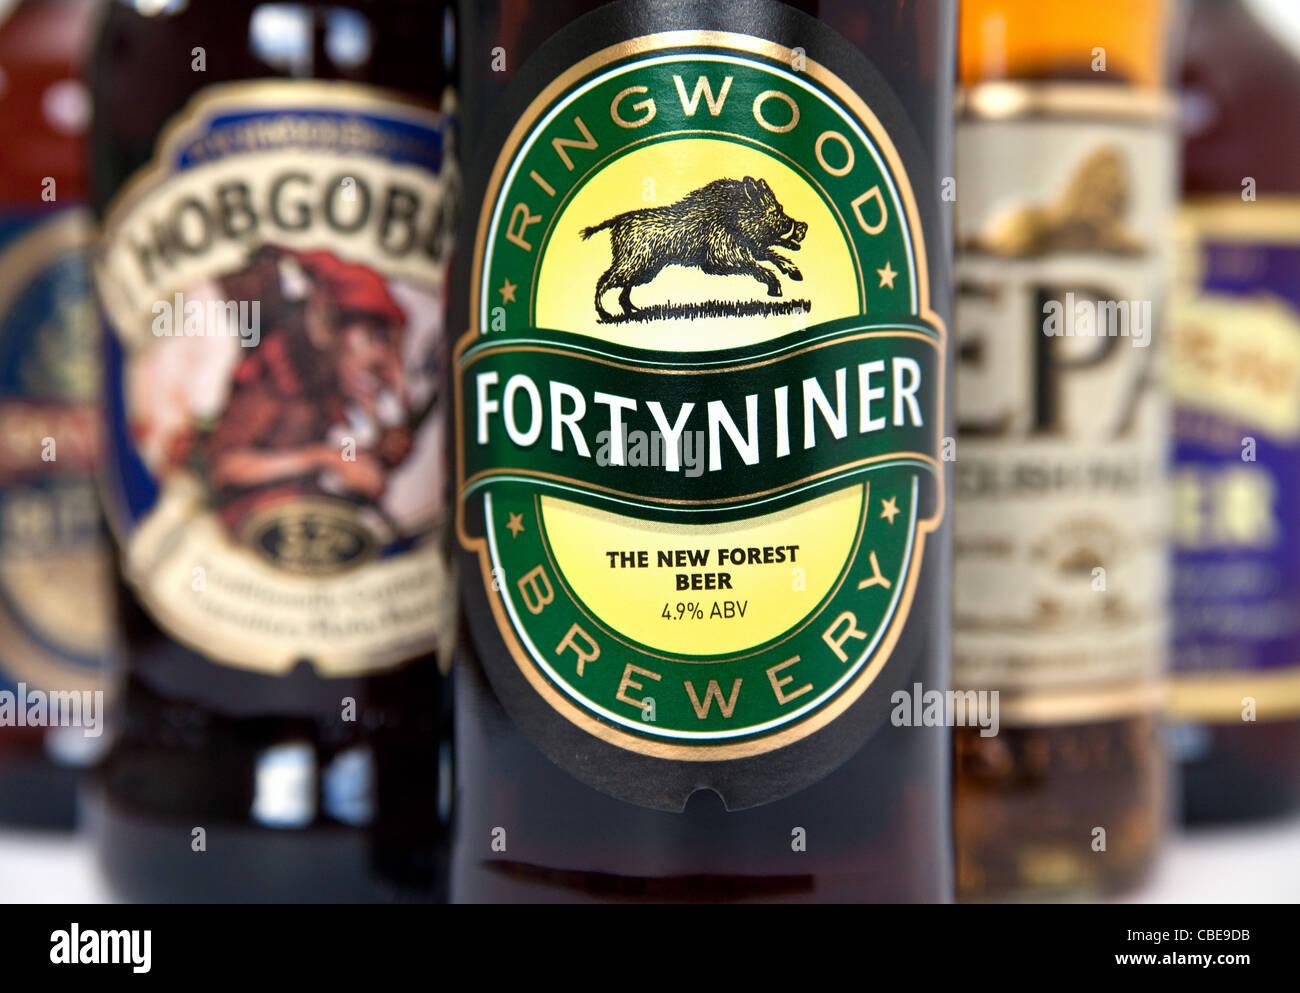 Several British bottled beers - Stock Image